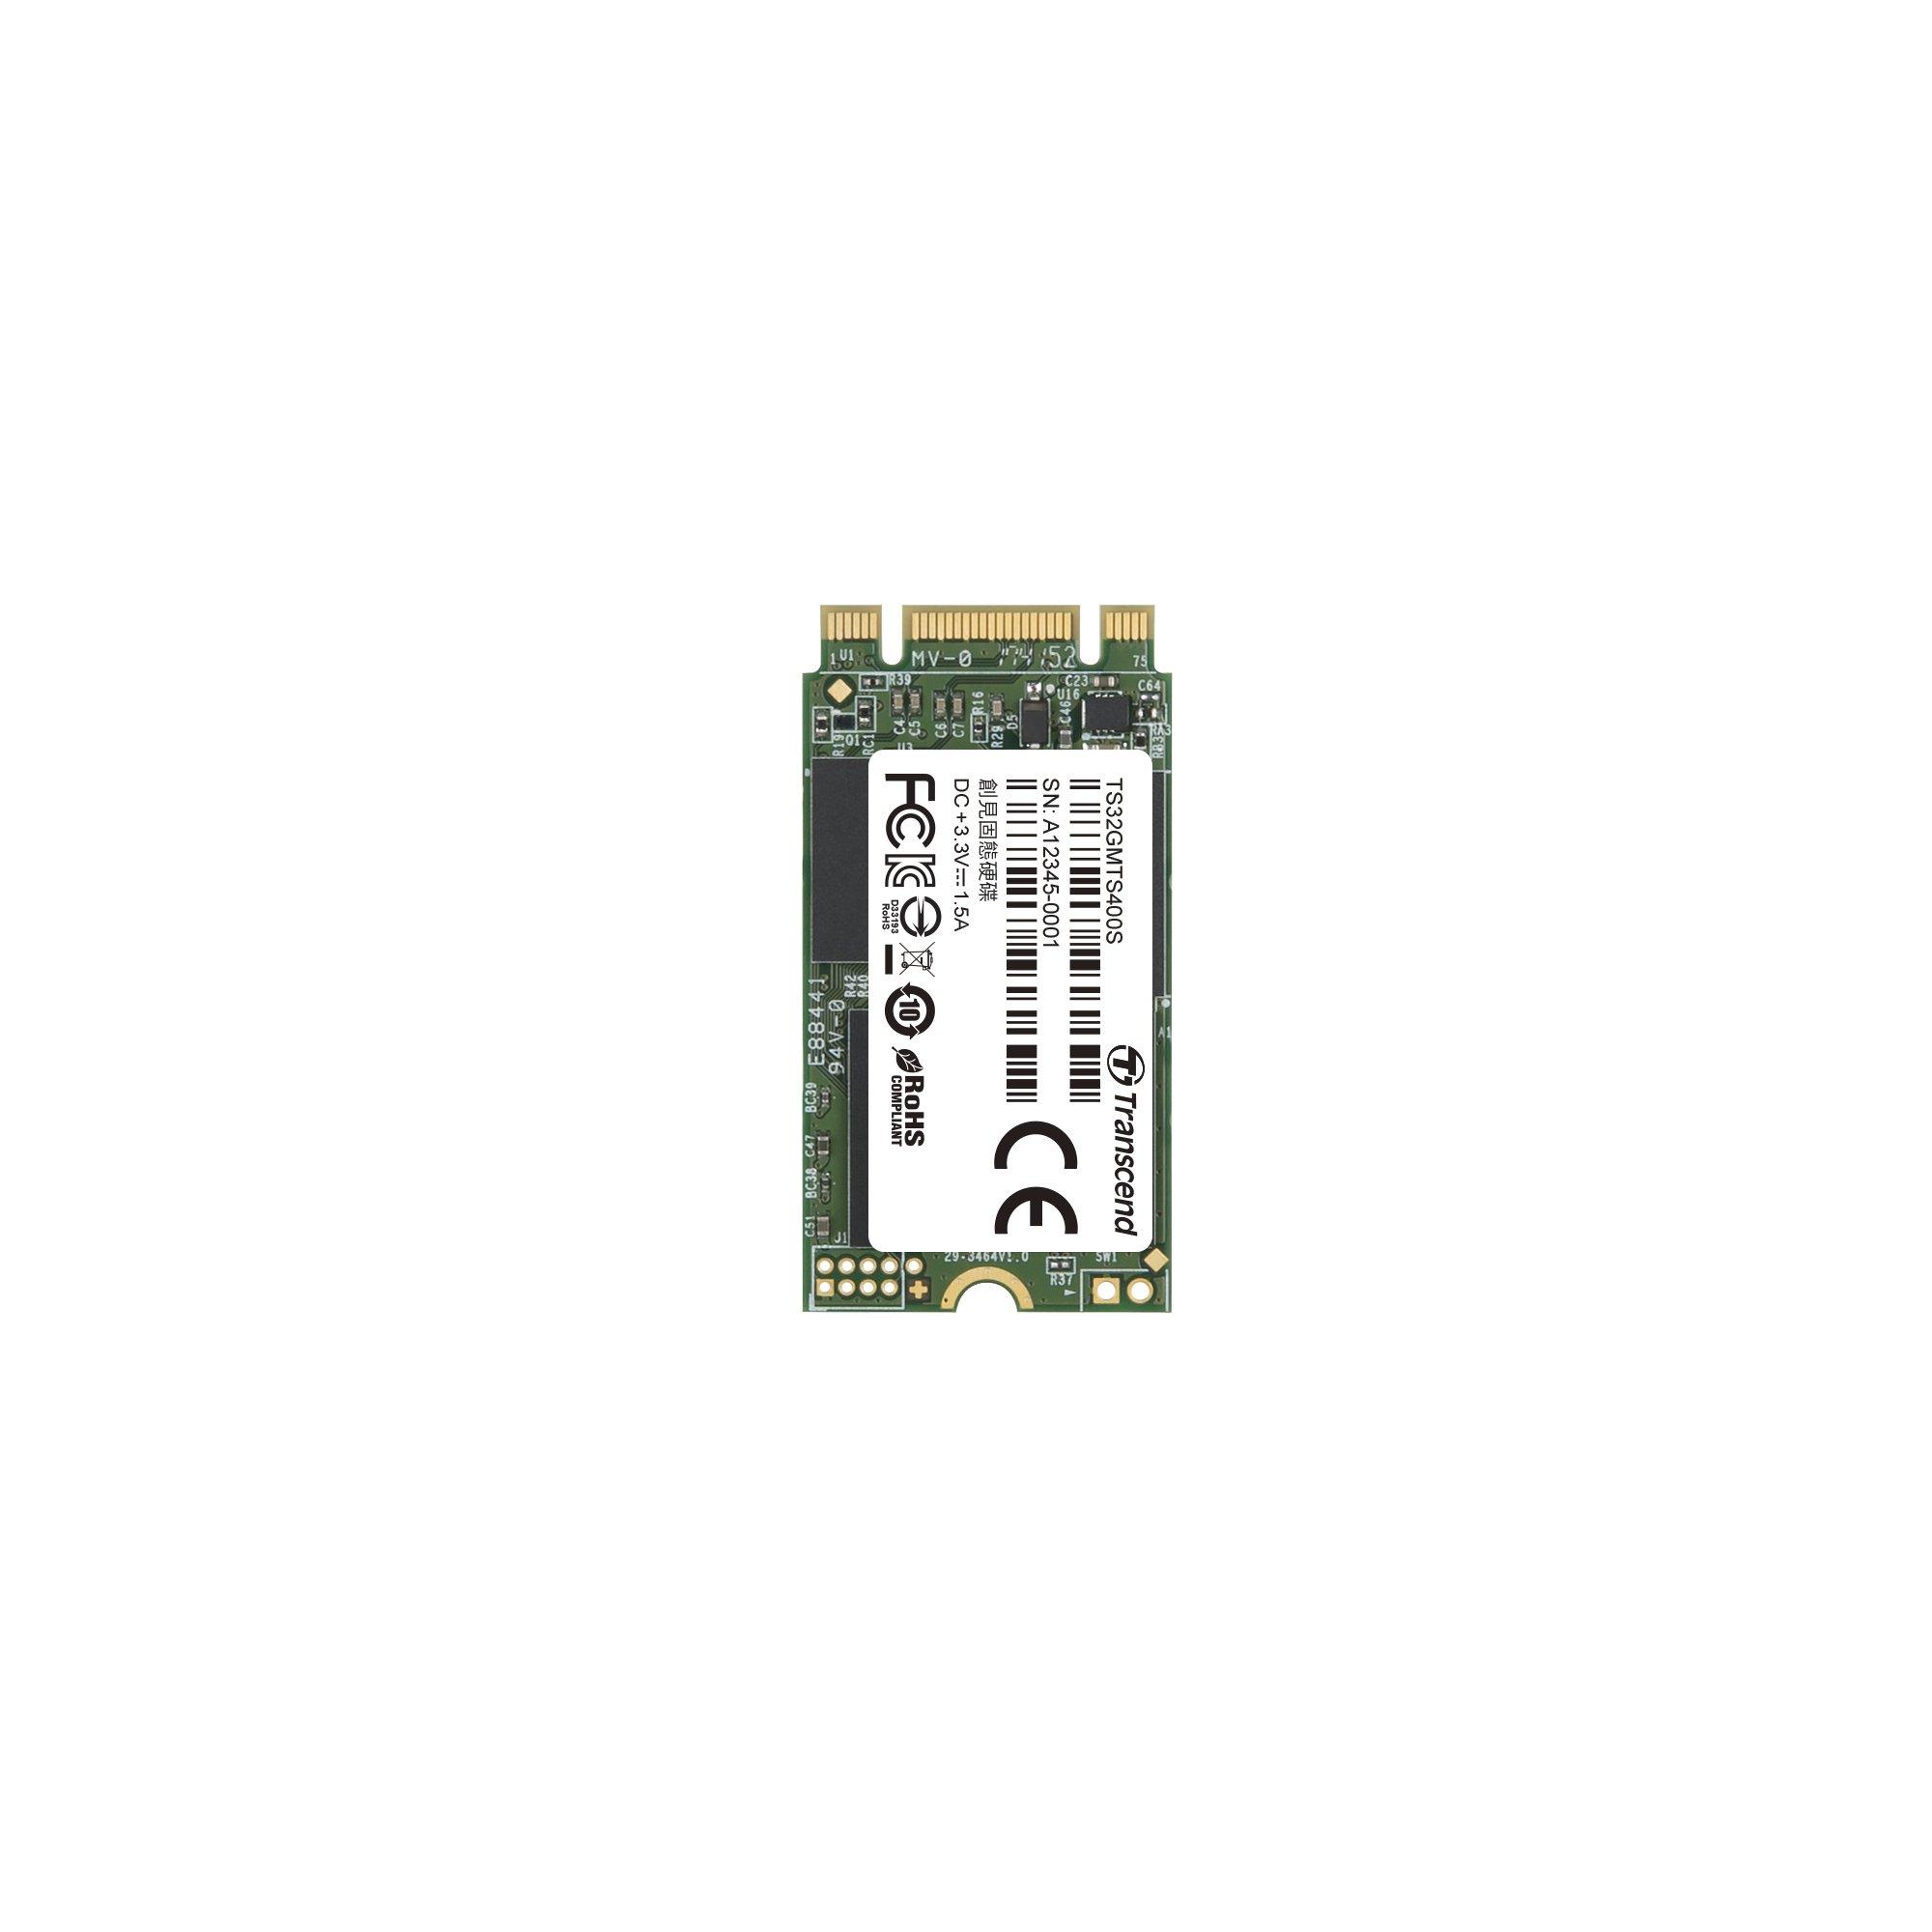 Transcend 32GB SATA III 6Gb/s MTS400 42 mm M.2 SSD Solid State Drive (TS32GMTS400S)